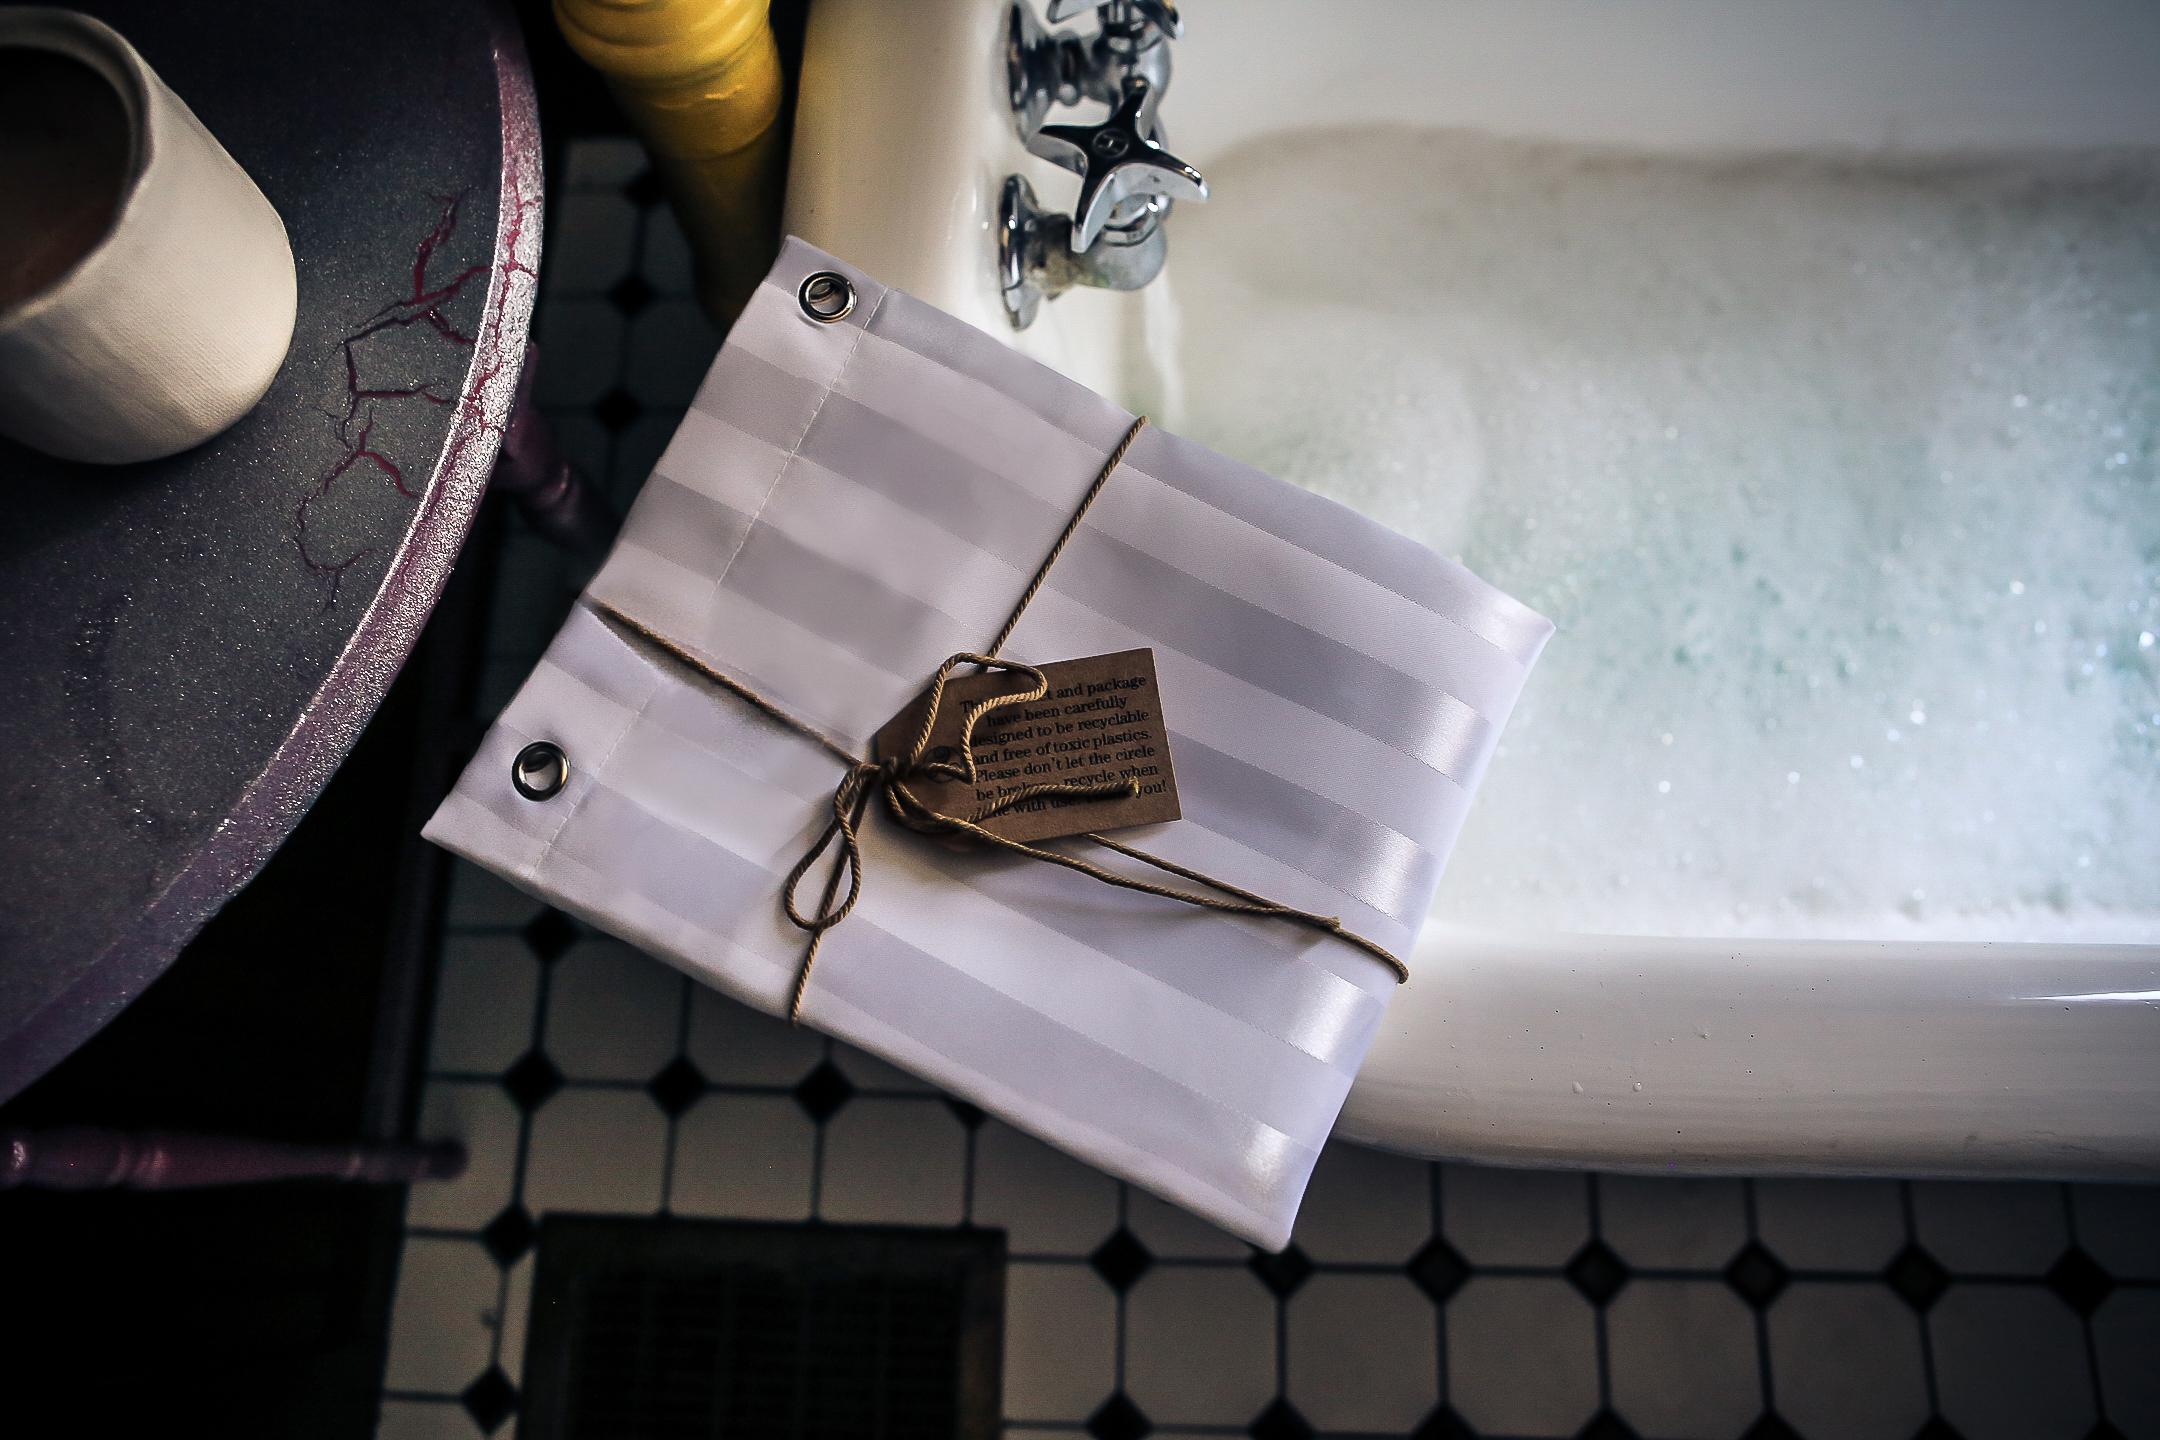 Shower Curtain Liner Displayed On Ledge Of Clawfoot Bathtub Bubble Bath